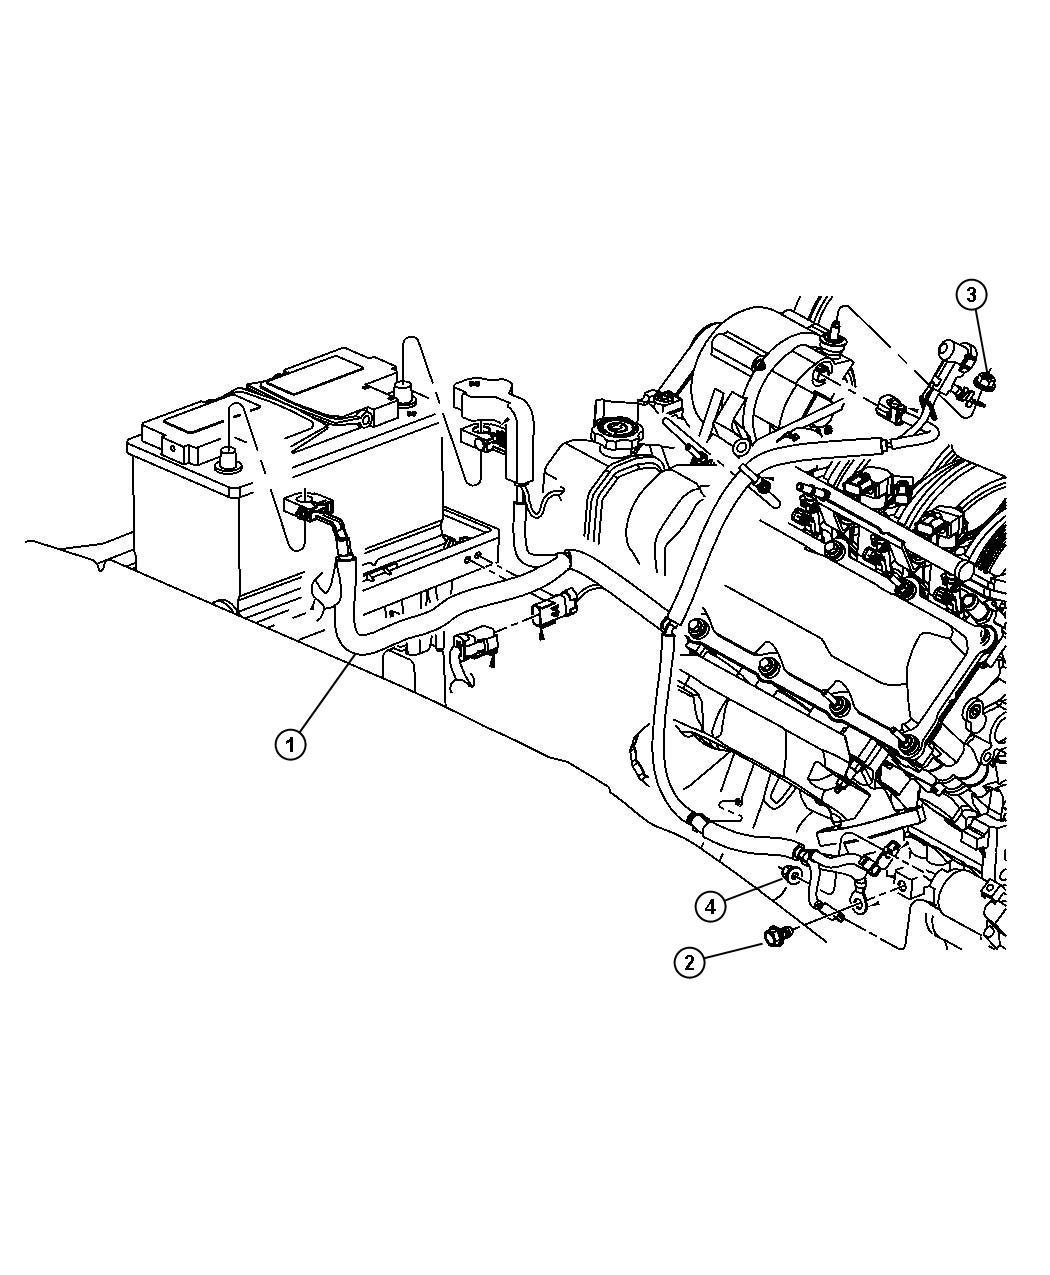 tags: #vacuum hose diagram 1985 dodge plymouth#1977 dodge 360 sportsman  vacuum diagrams#monaco motorhome wiring diagram#dodge motorhome wiring